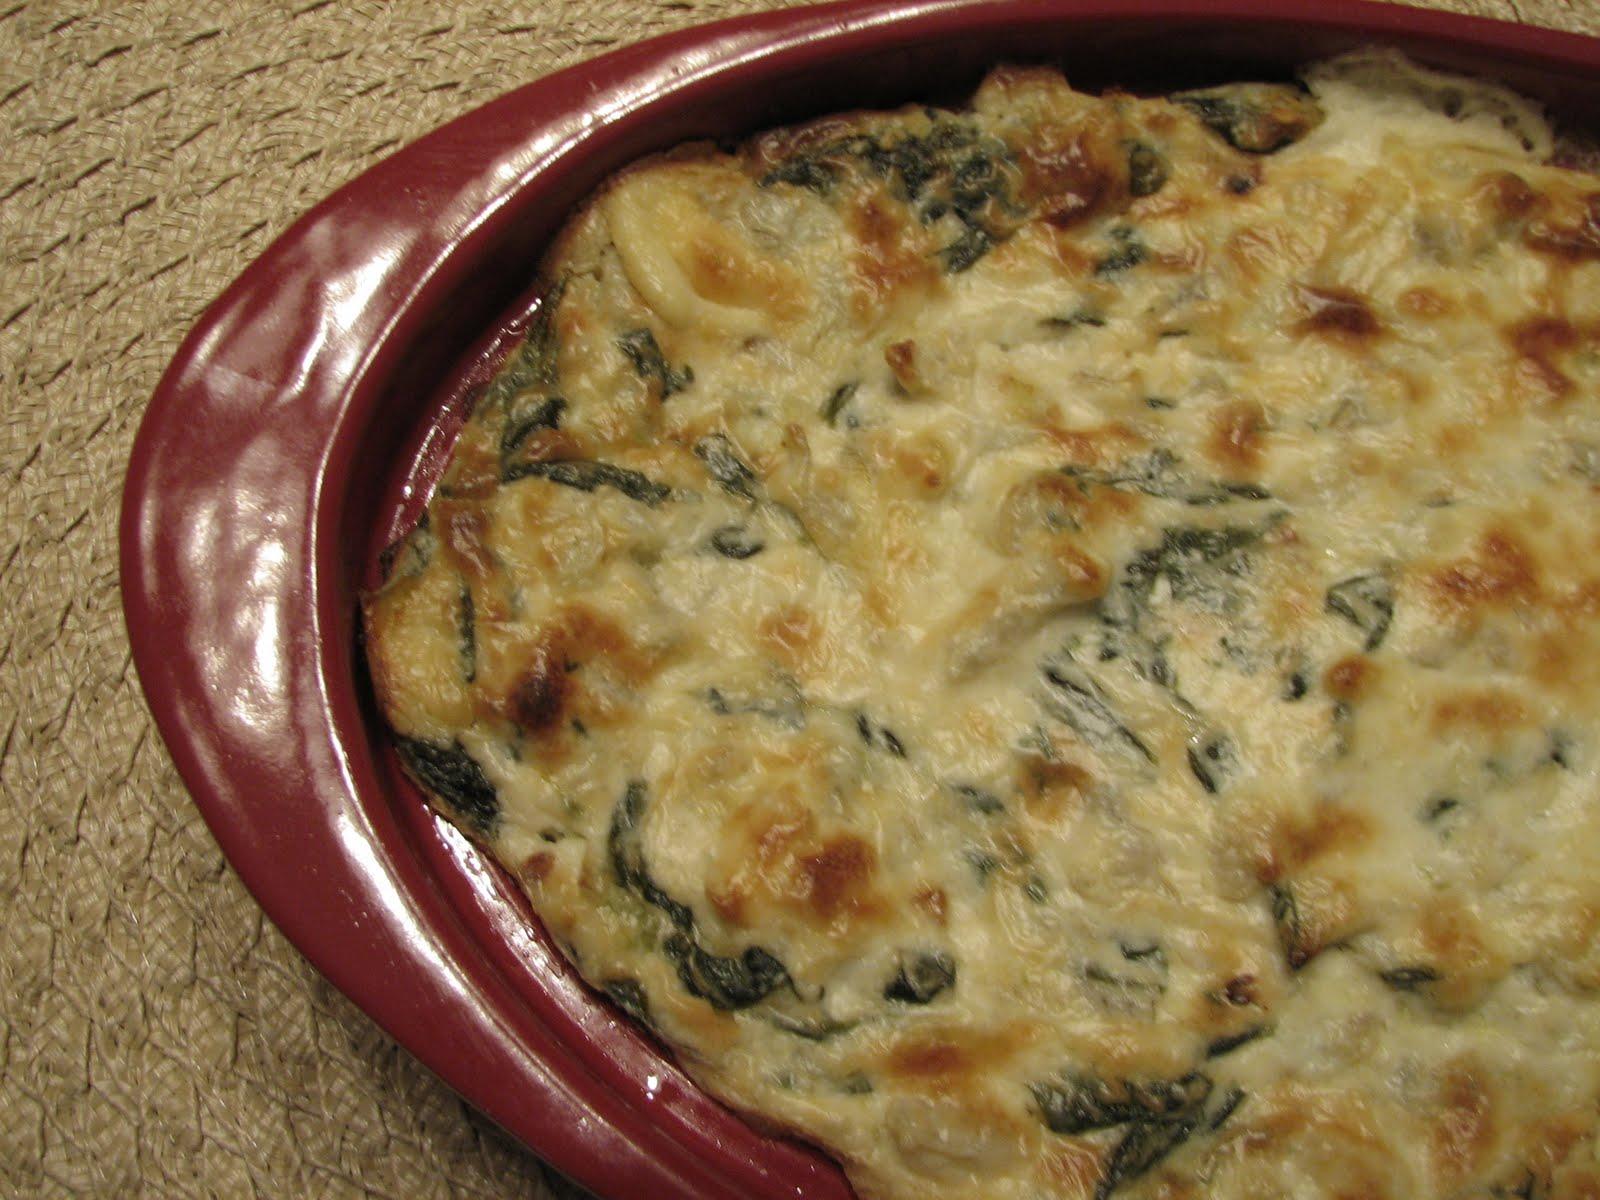 Lynda's Recipe Box: Spinach and Artichoke Dip